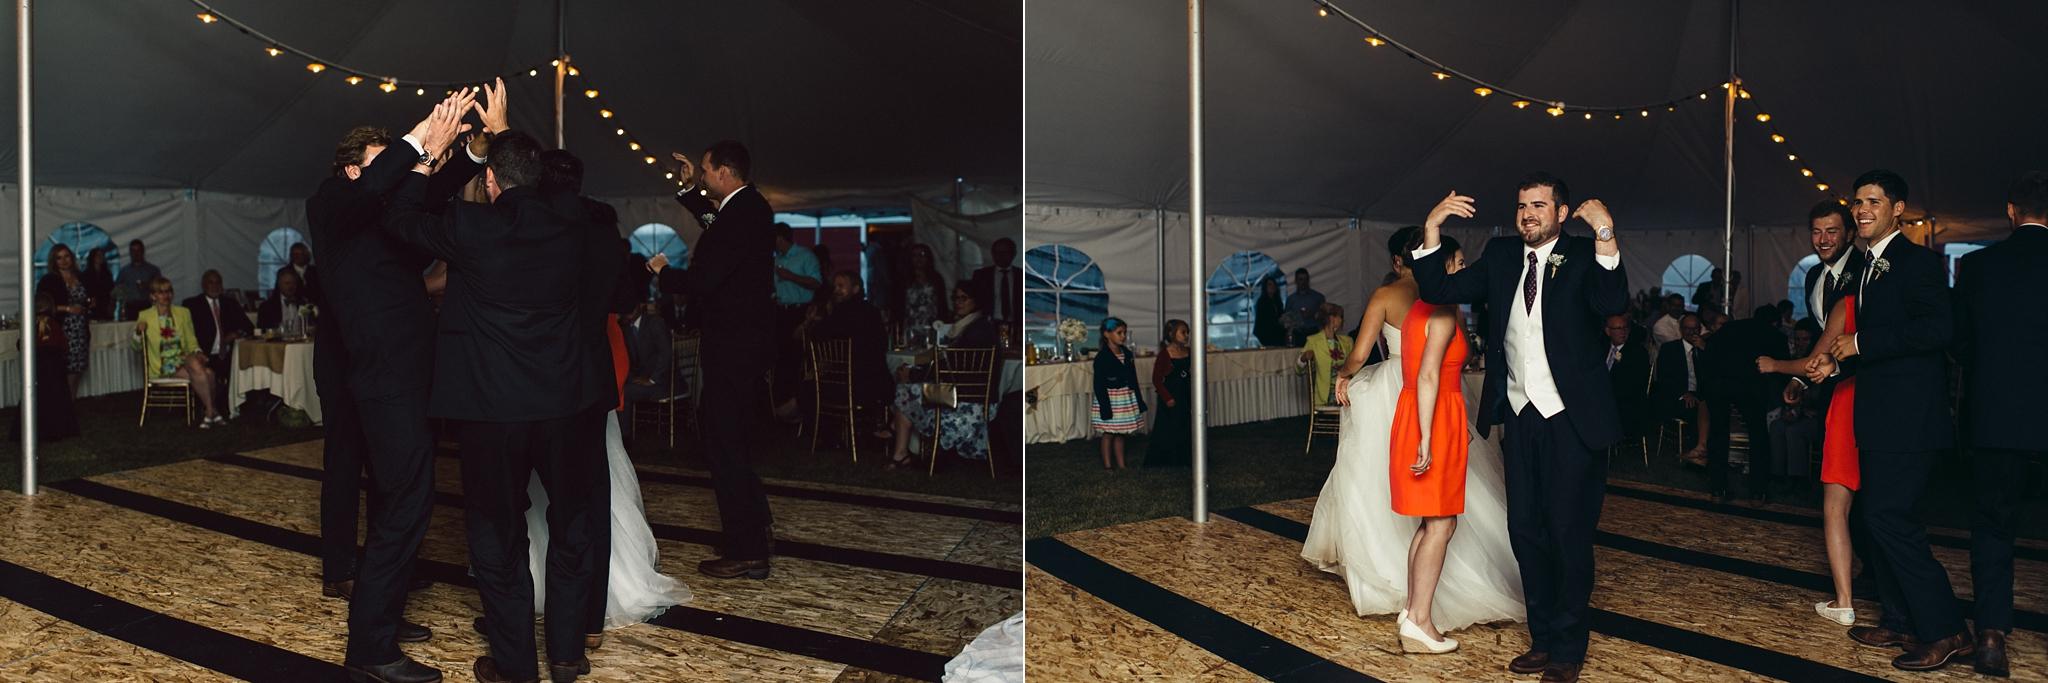 kaihla_tonai_intimate_wedding_elopement_photographer_0080